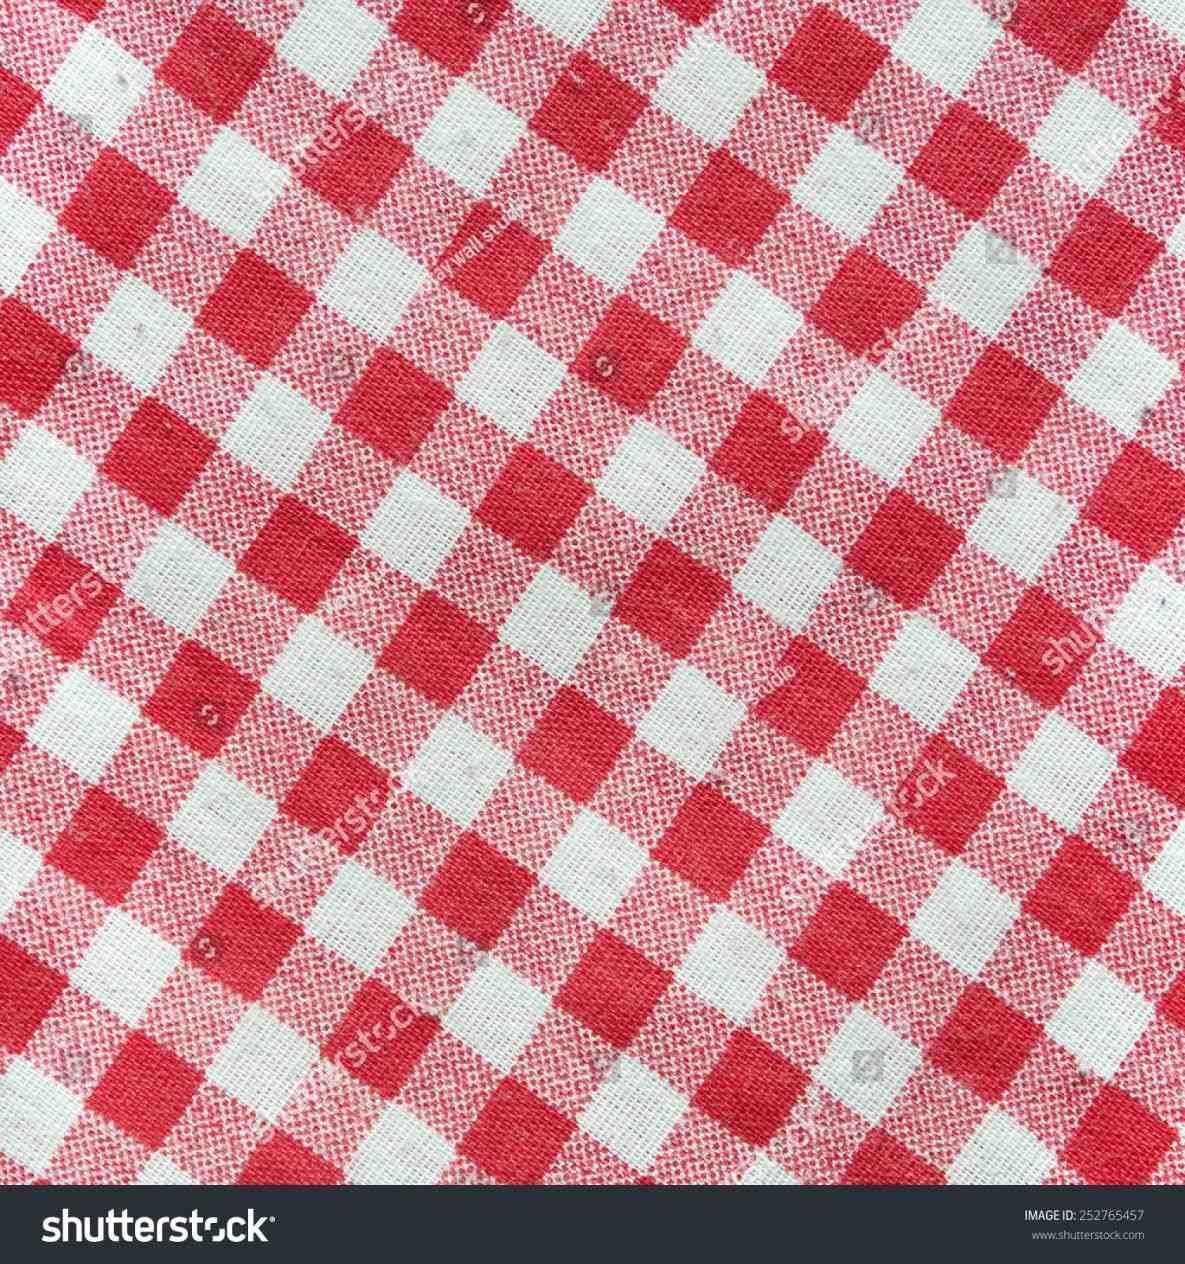 Picnic Blanket Clipart.